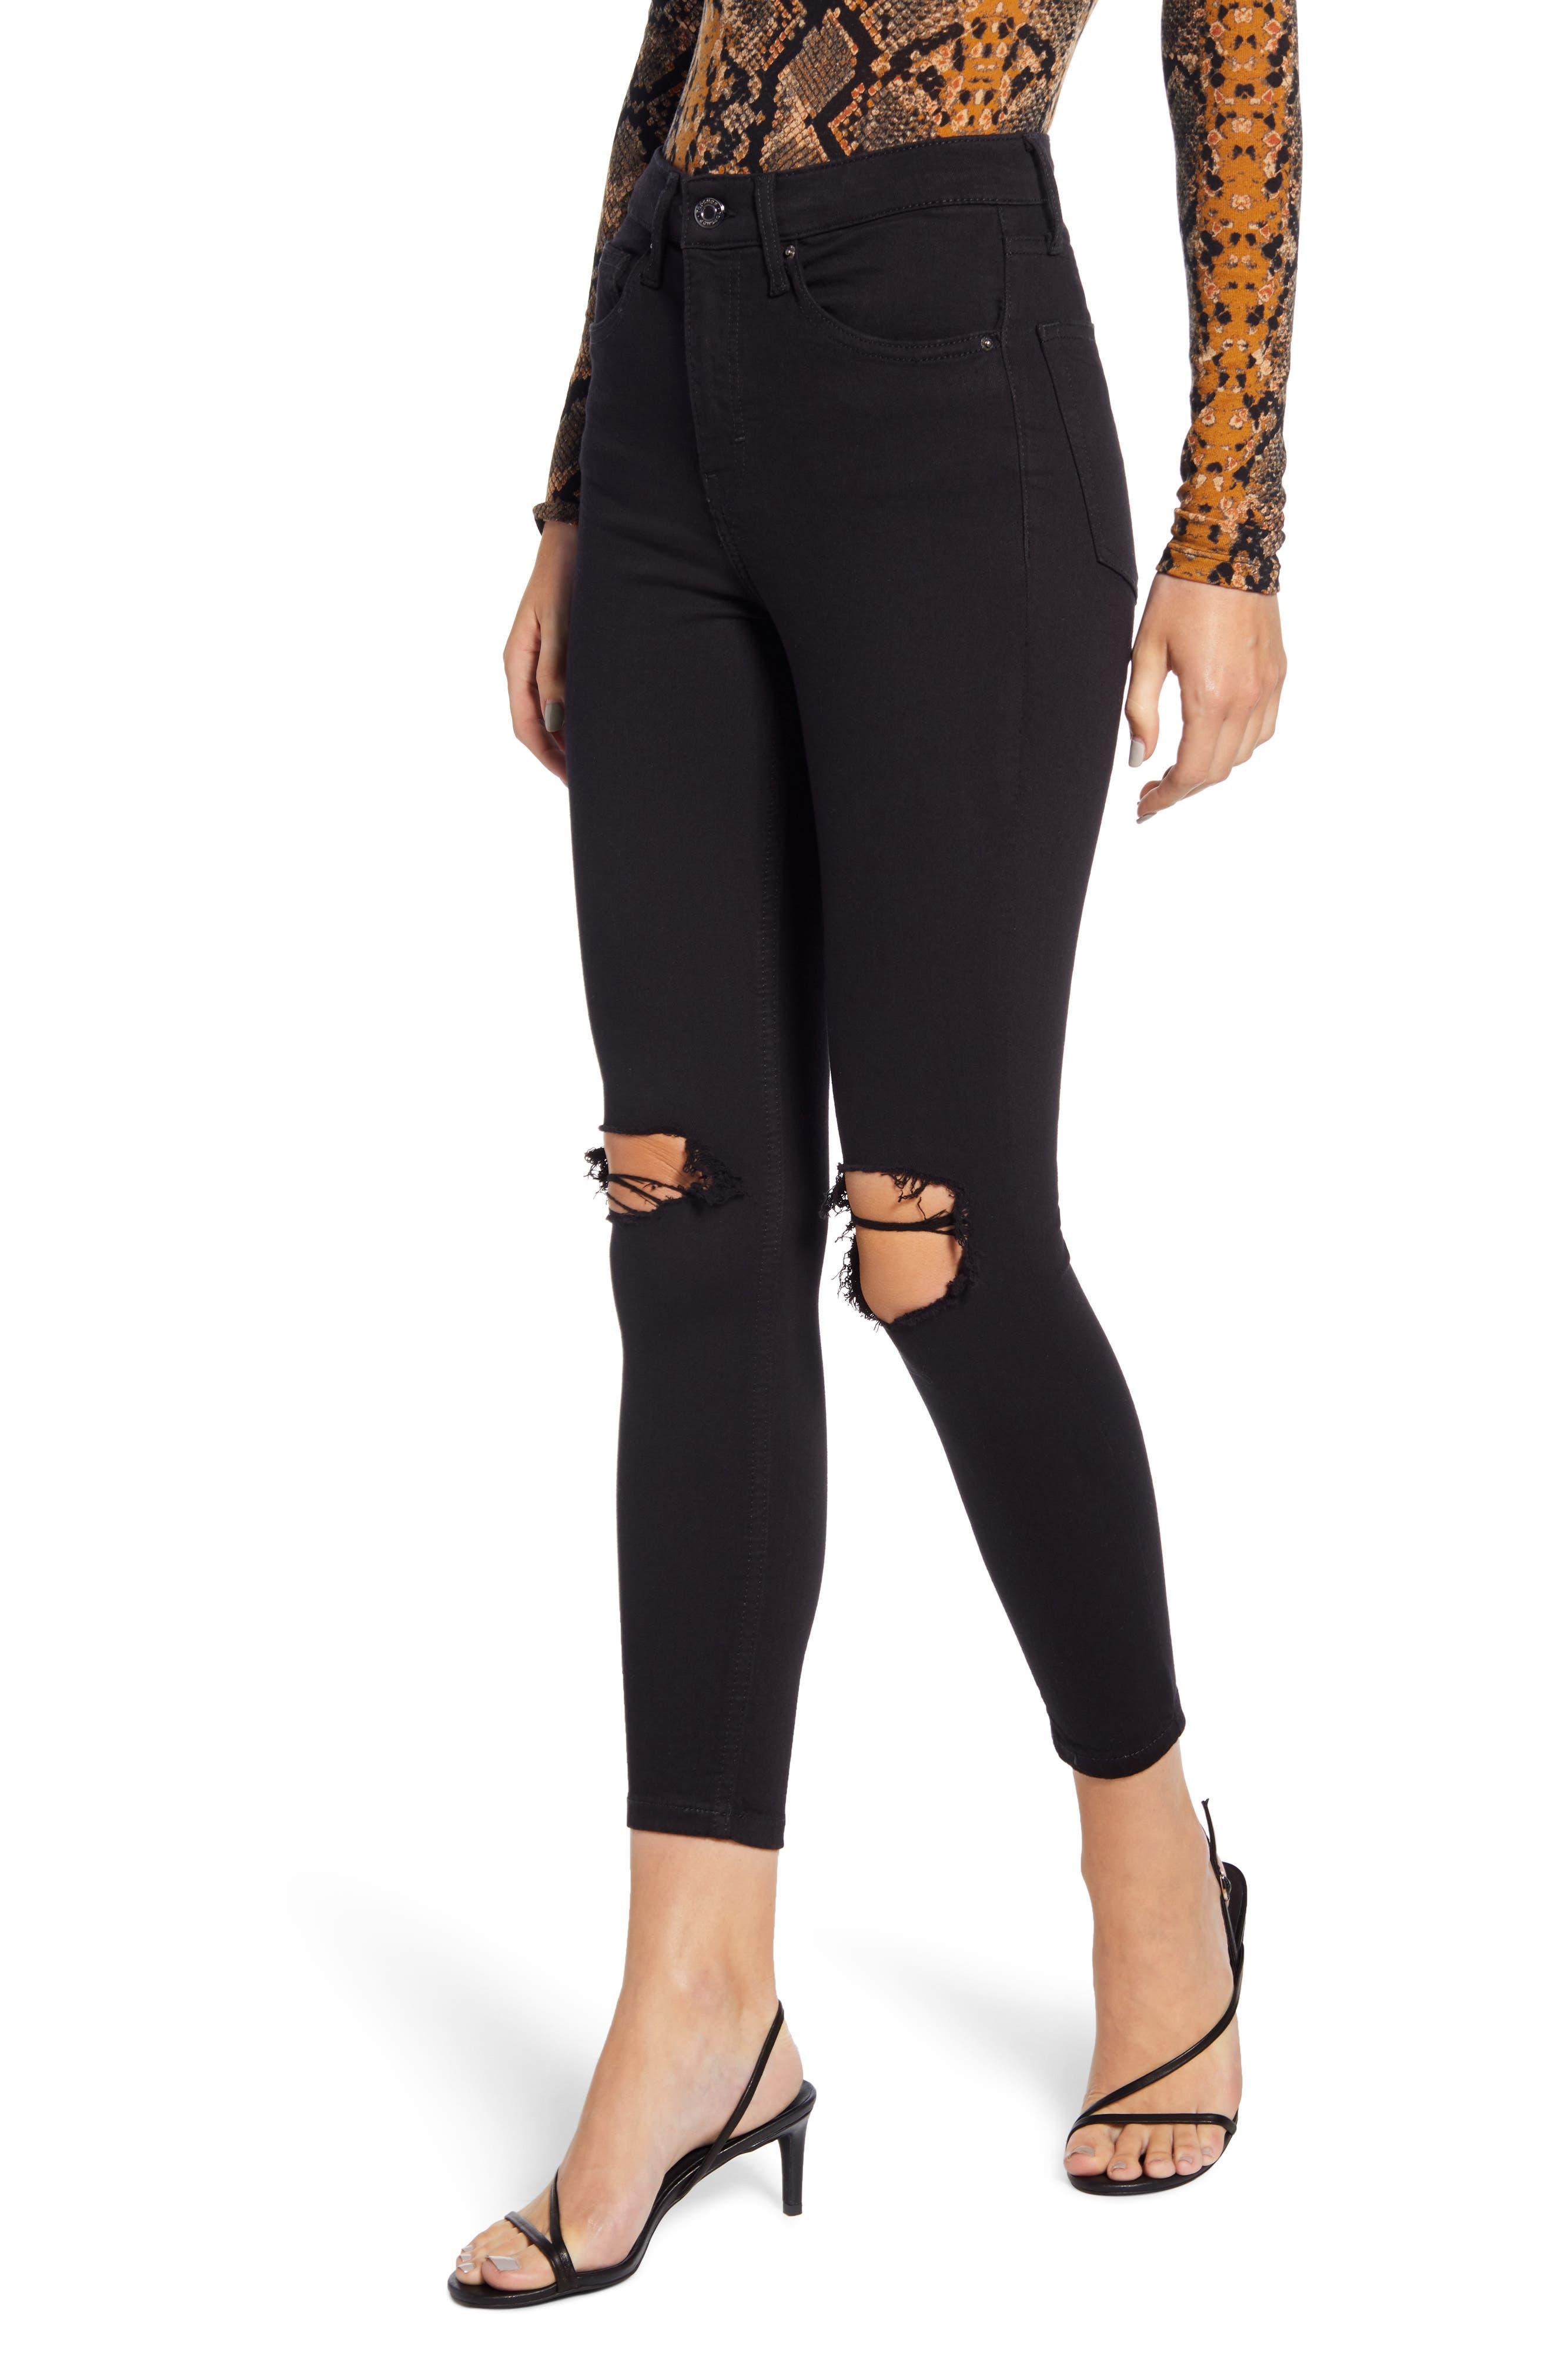 Petite Women's Topshop Jamie High Waist Ripped Skinny Jeans,  26W x 28L (fits like 25-26W) - Black